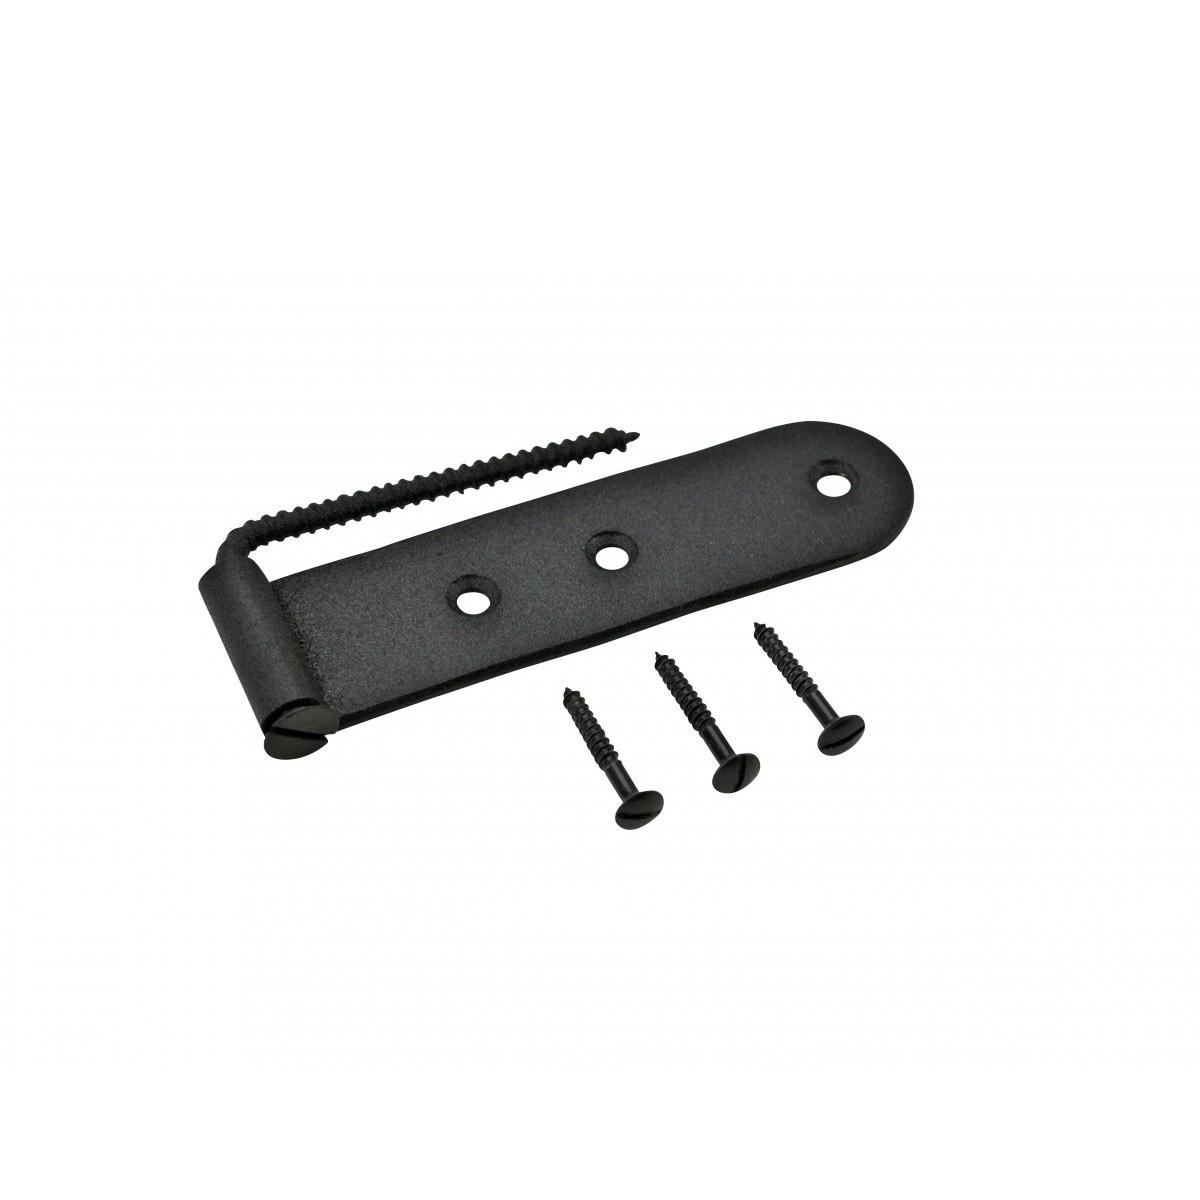 6 Shutter Strap Hinge Black Steel Galvanized Shutter Dog Hinge Shutter Hardware Shutter Dogs